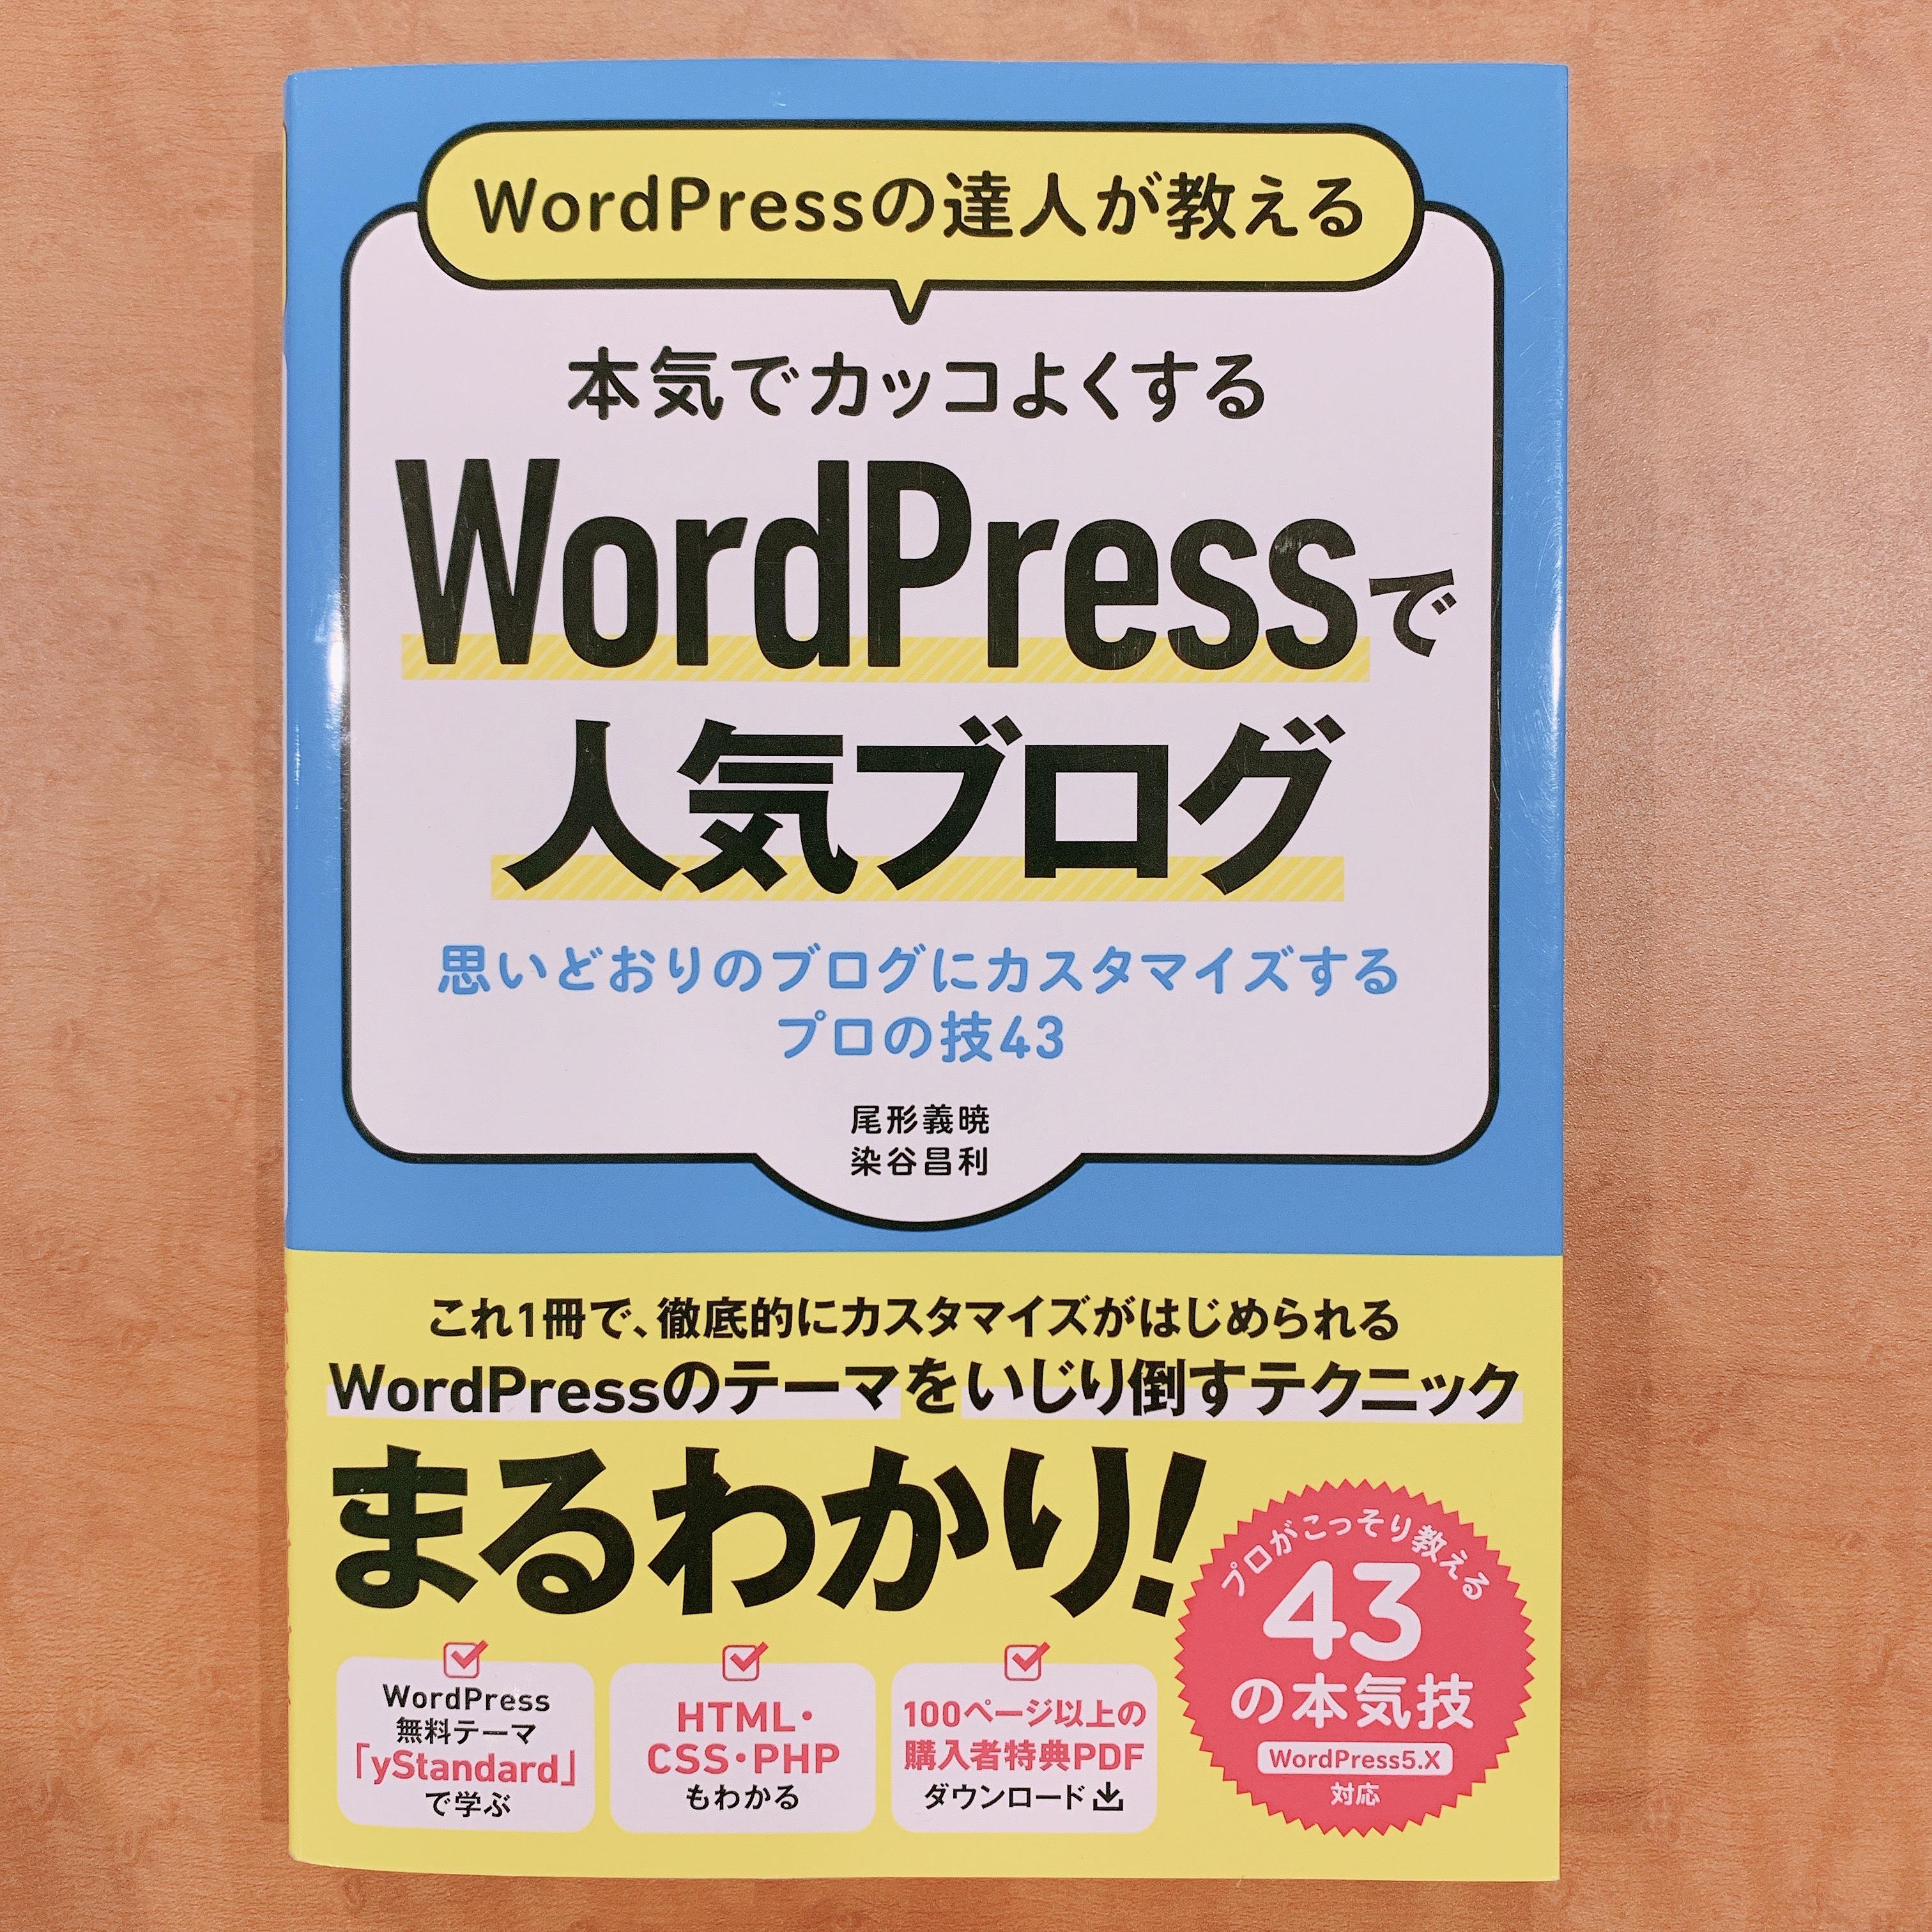 img 1252 - WordPressでブログを書くメリット、デメリット